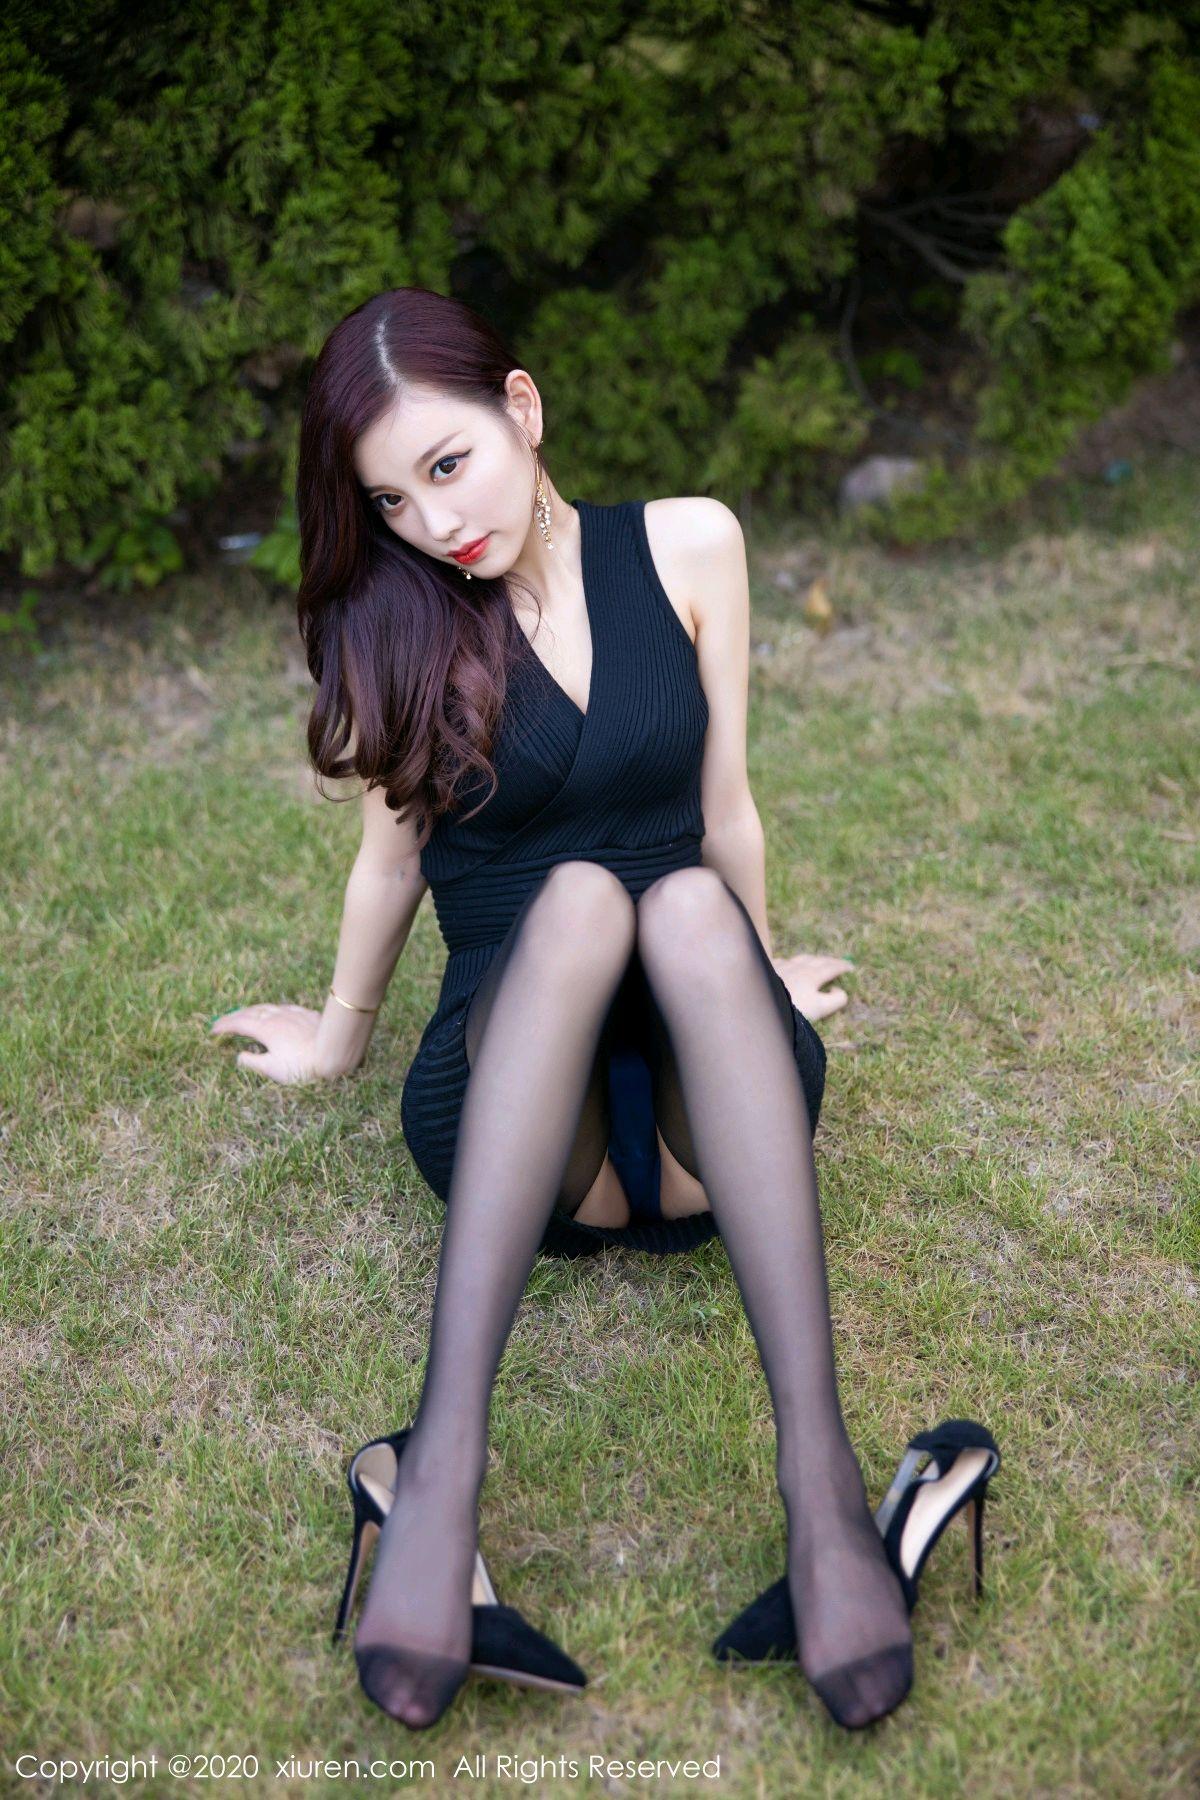 [XiuRen] Vol.2648 Yang Chen Chen 21P, Black Silk, Outdoor, Xiuren, Yang Chen Chen